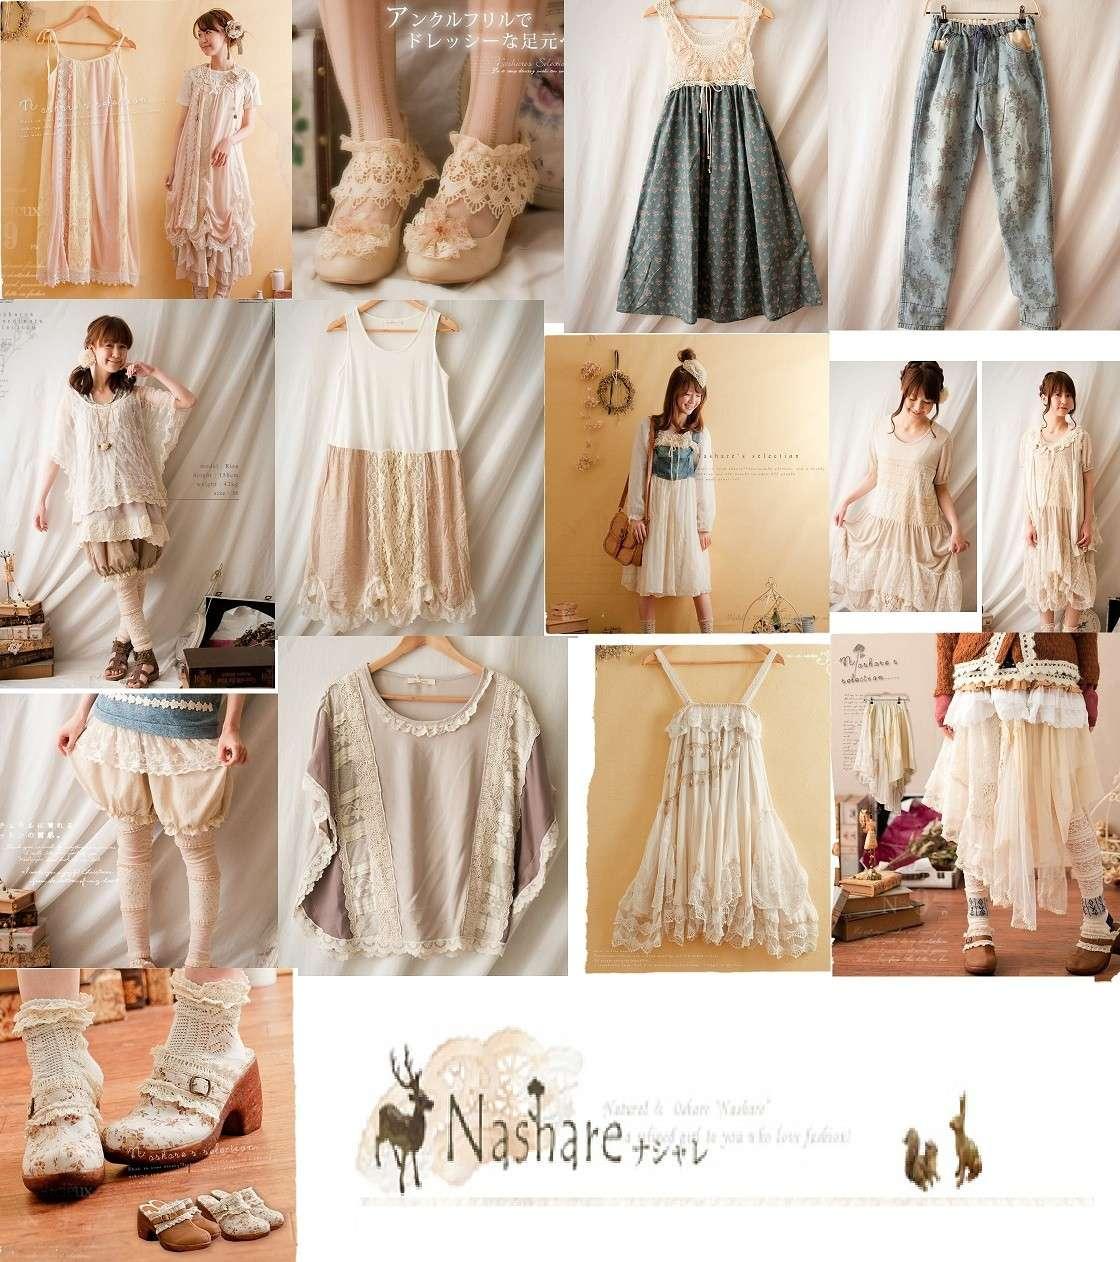 [shop] Nashare Nashar12